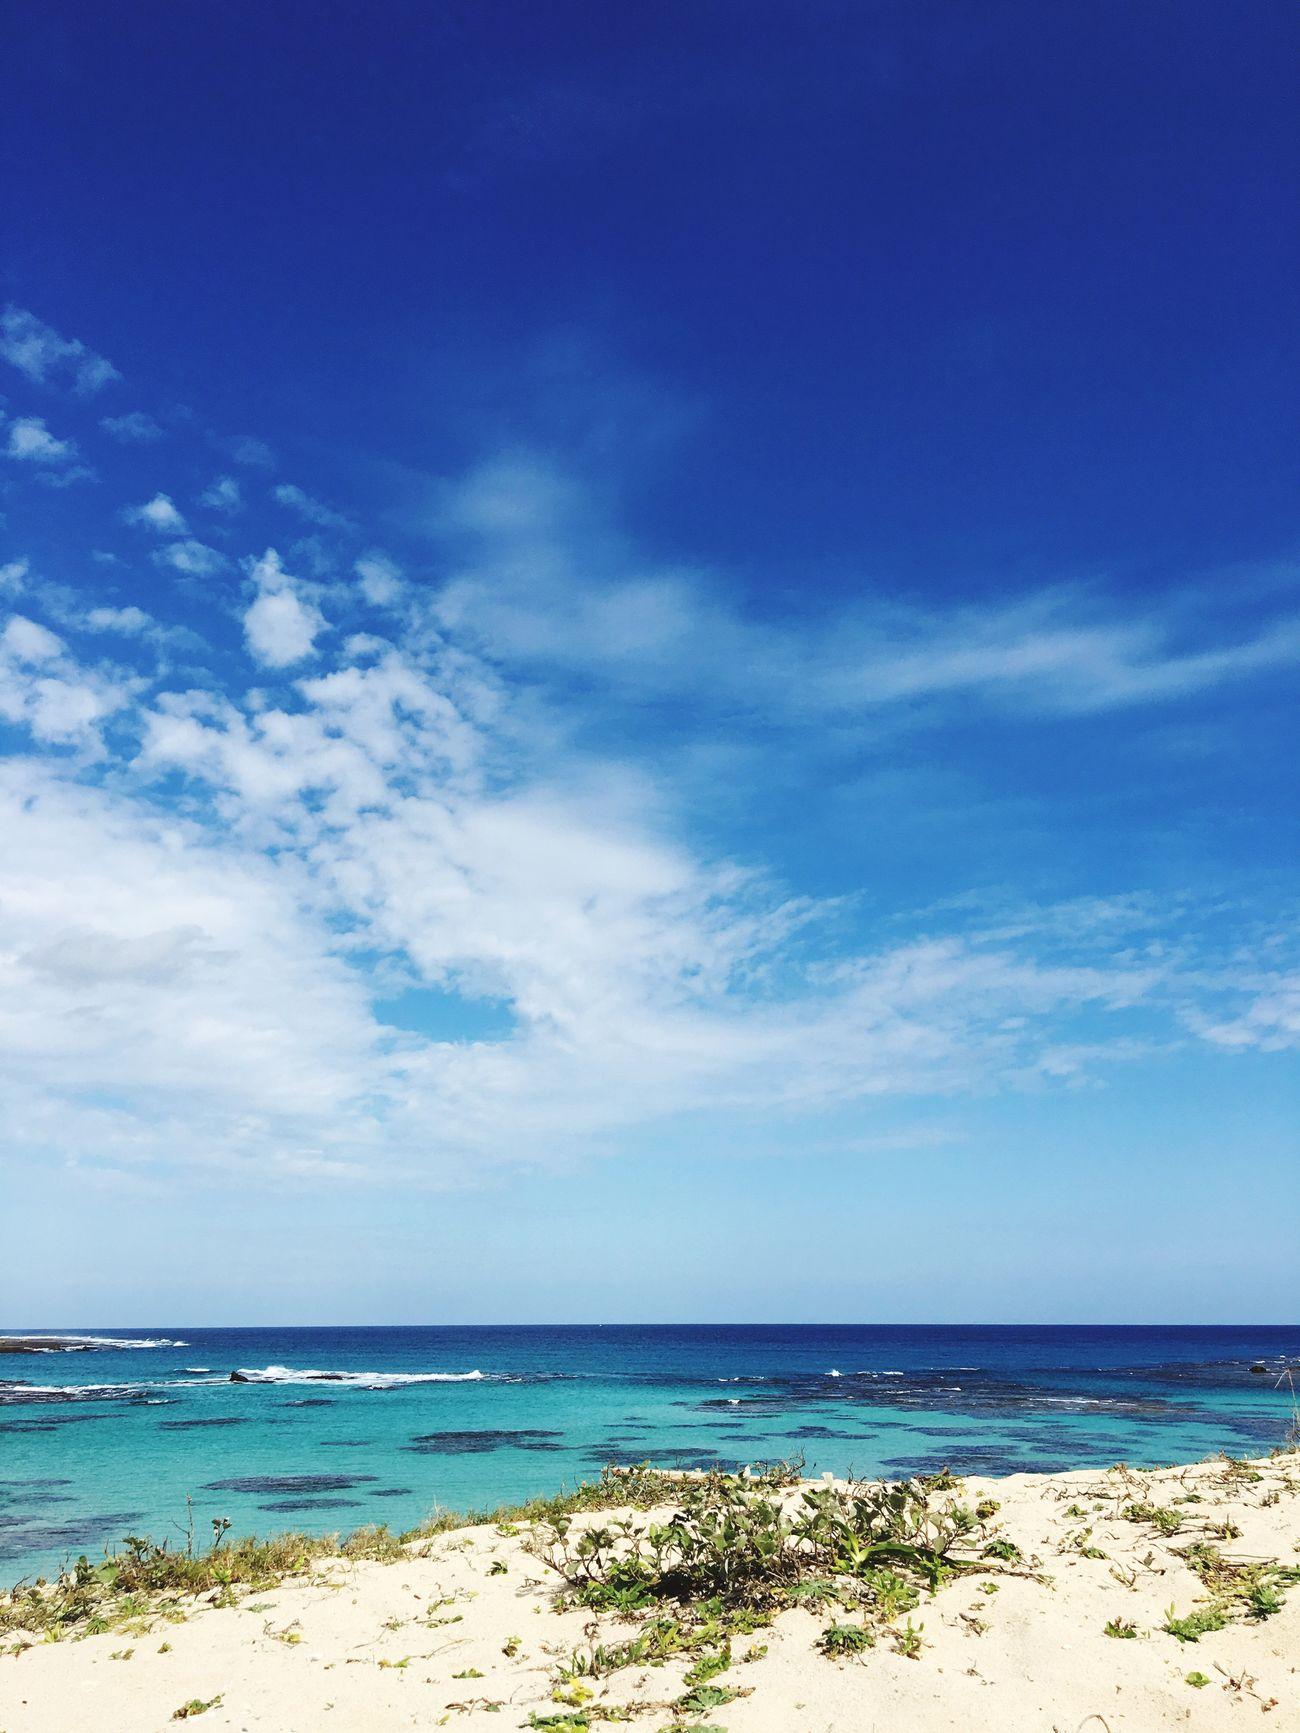 Beauty In Nature Beach Sea Sand Sky Blue Nature Horizon Over Water